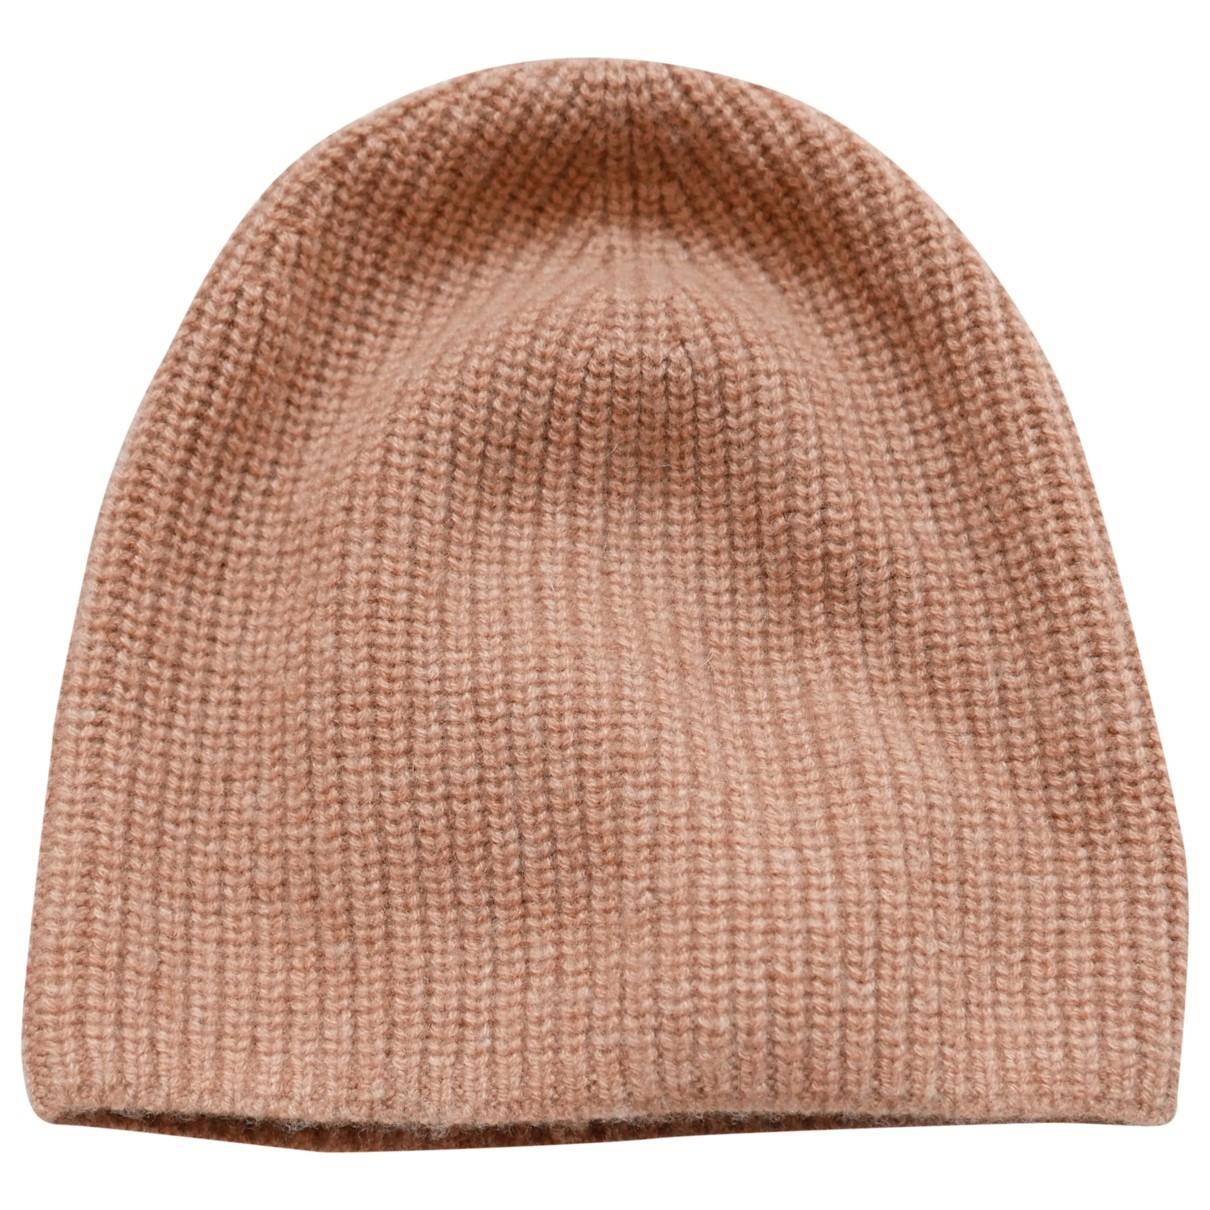 J.crew \N Beige Cashmere hat for Women M International